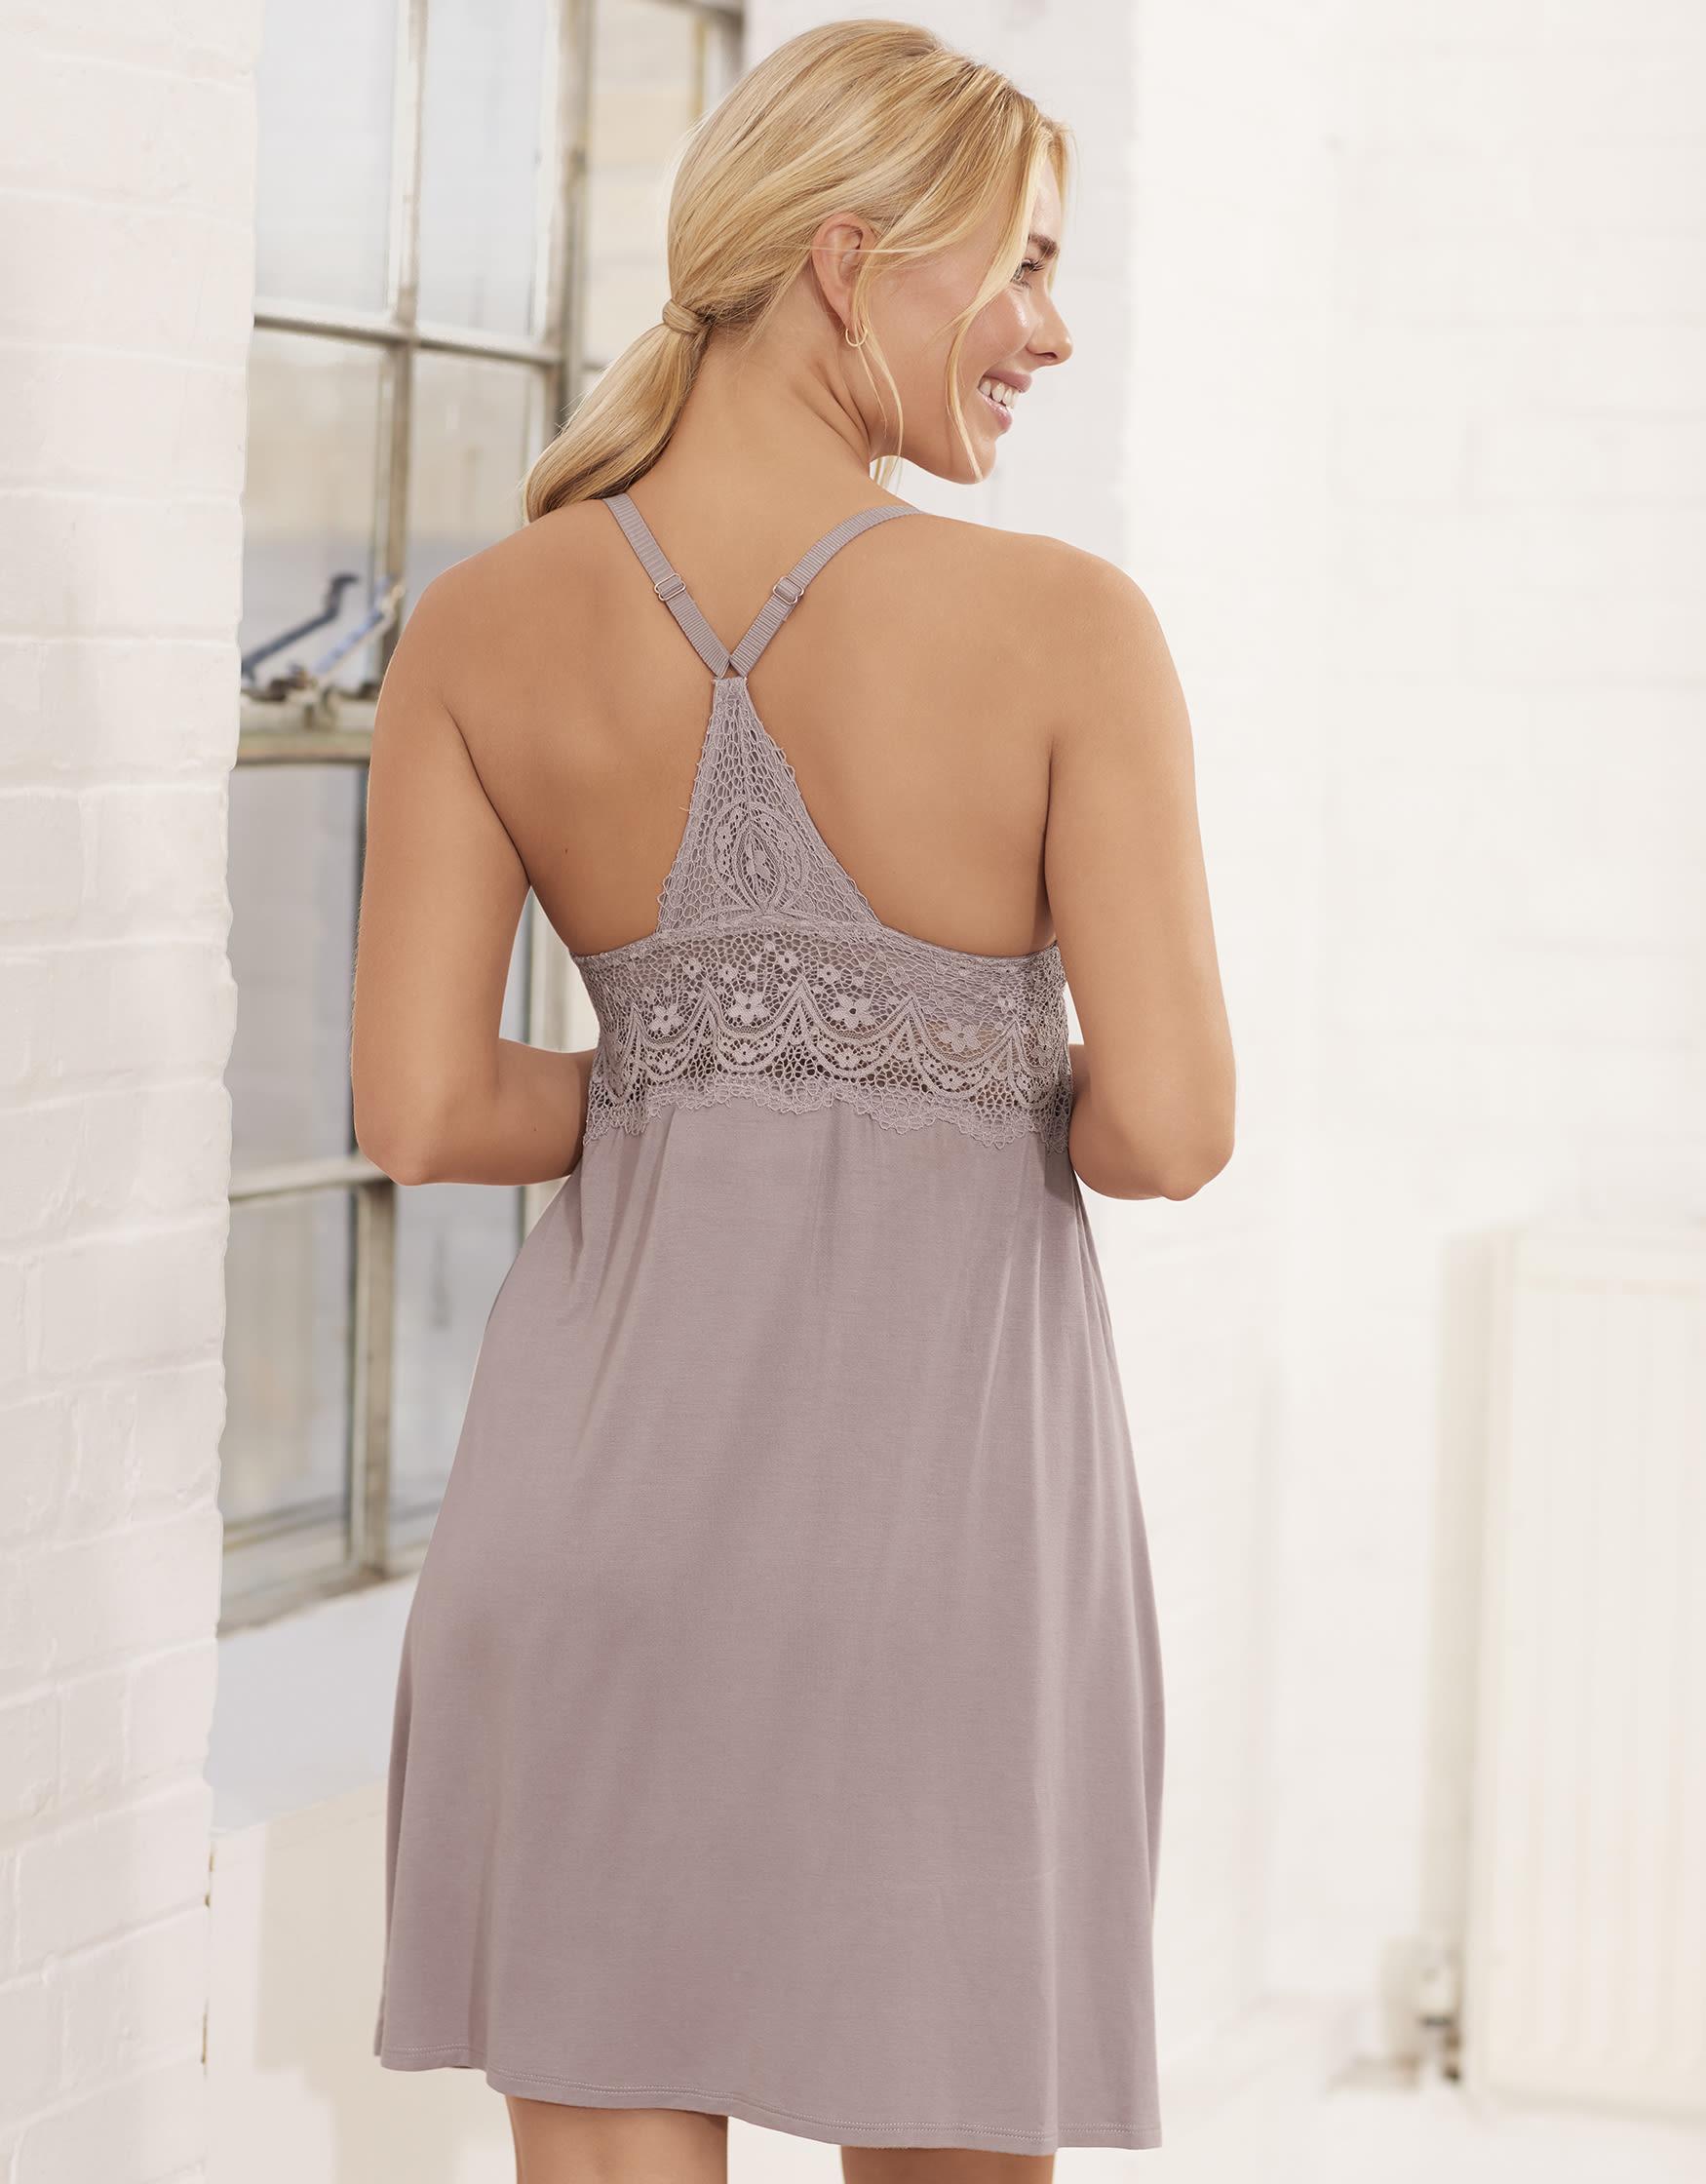 e43e9a50ff379 Pyjamas   Nightwear with Bra Support